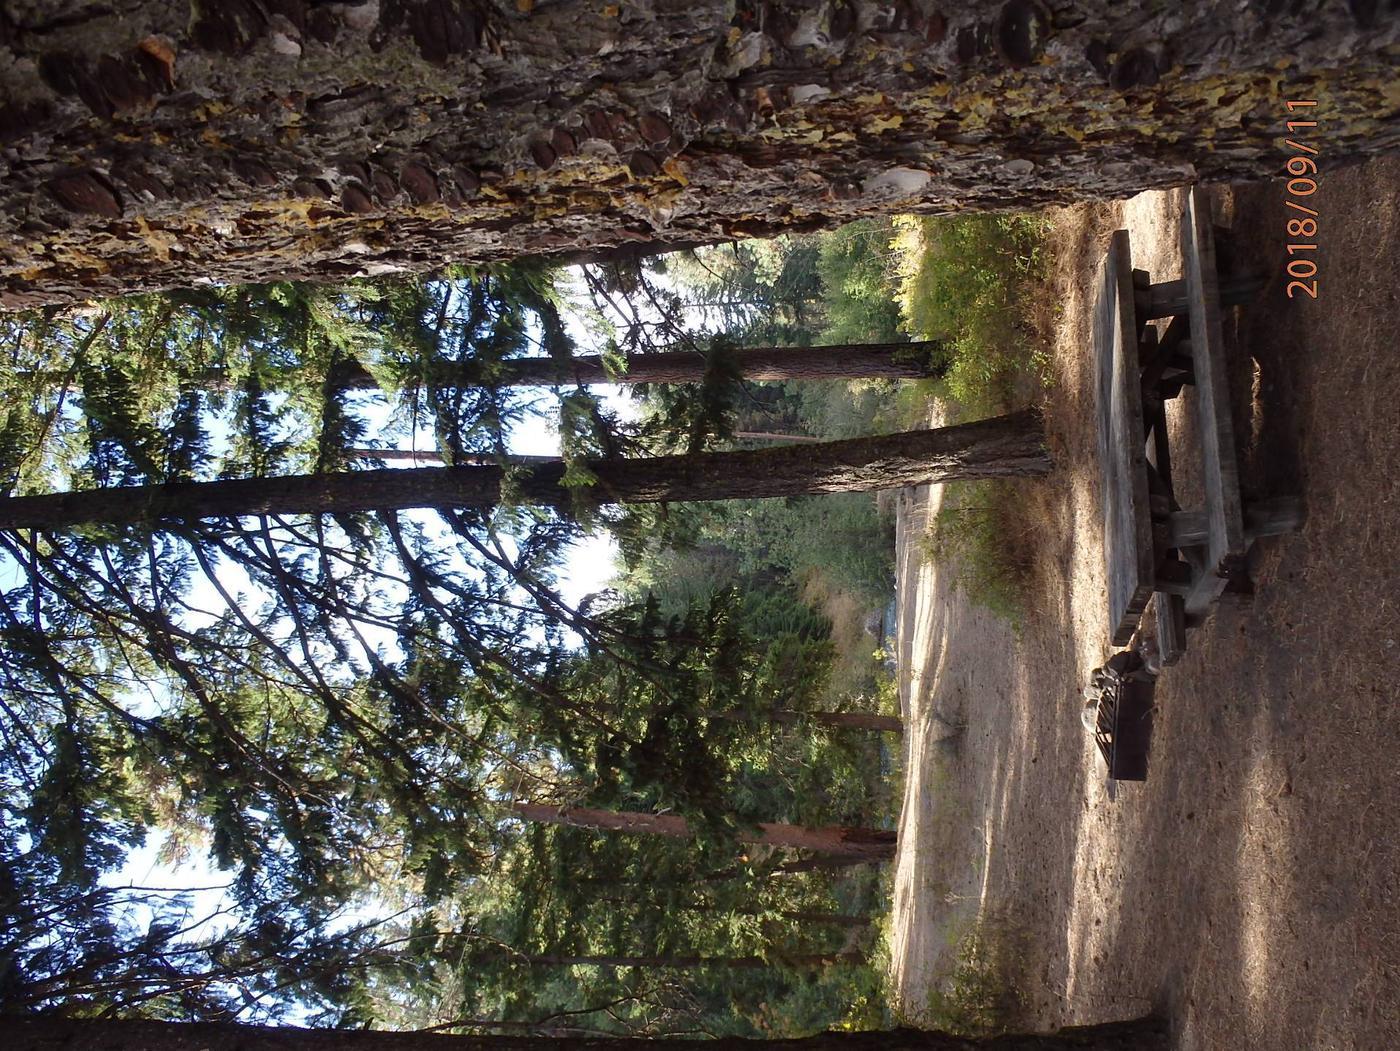 Hasue Creek CampgorundCampsite 22